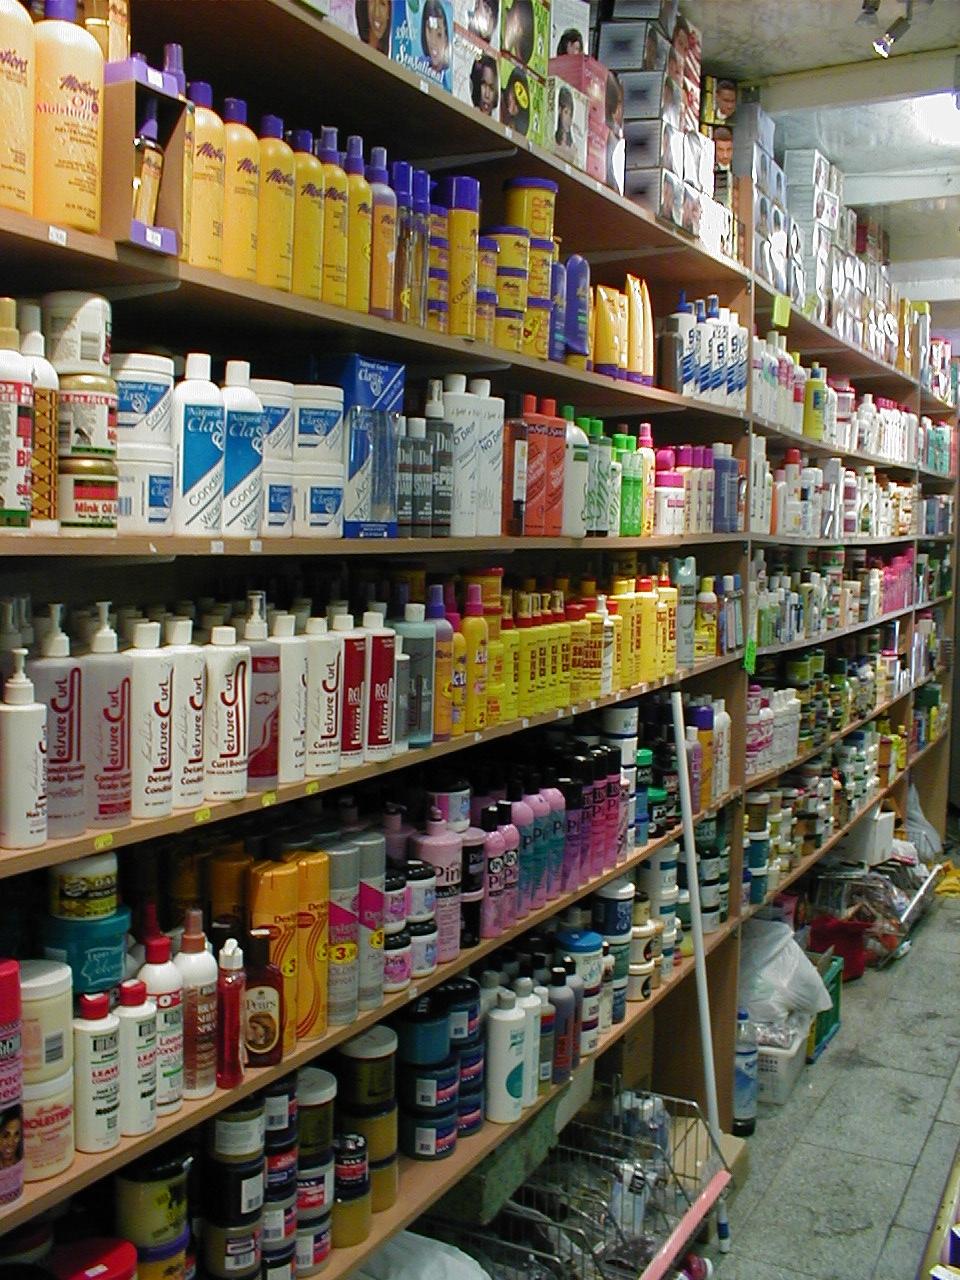 dario shop interior shelves products isle